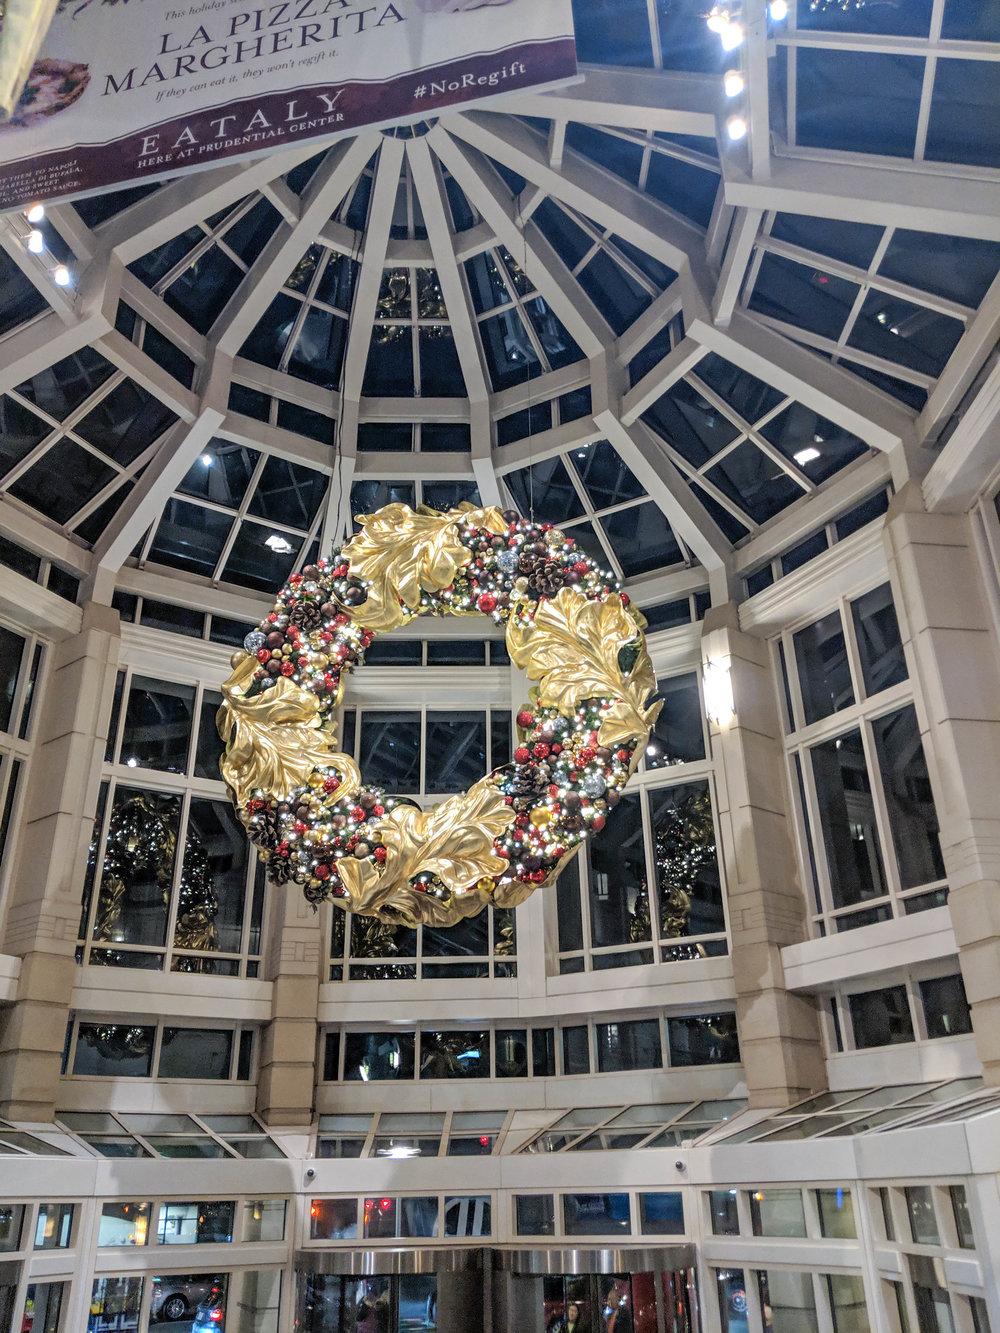 bri rinehart; boston; photography; Christmas